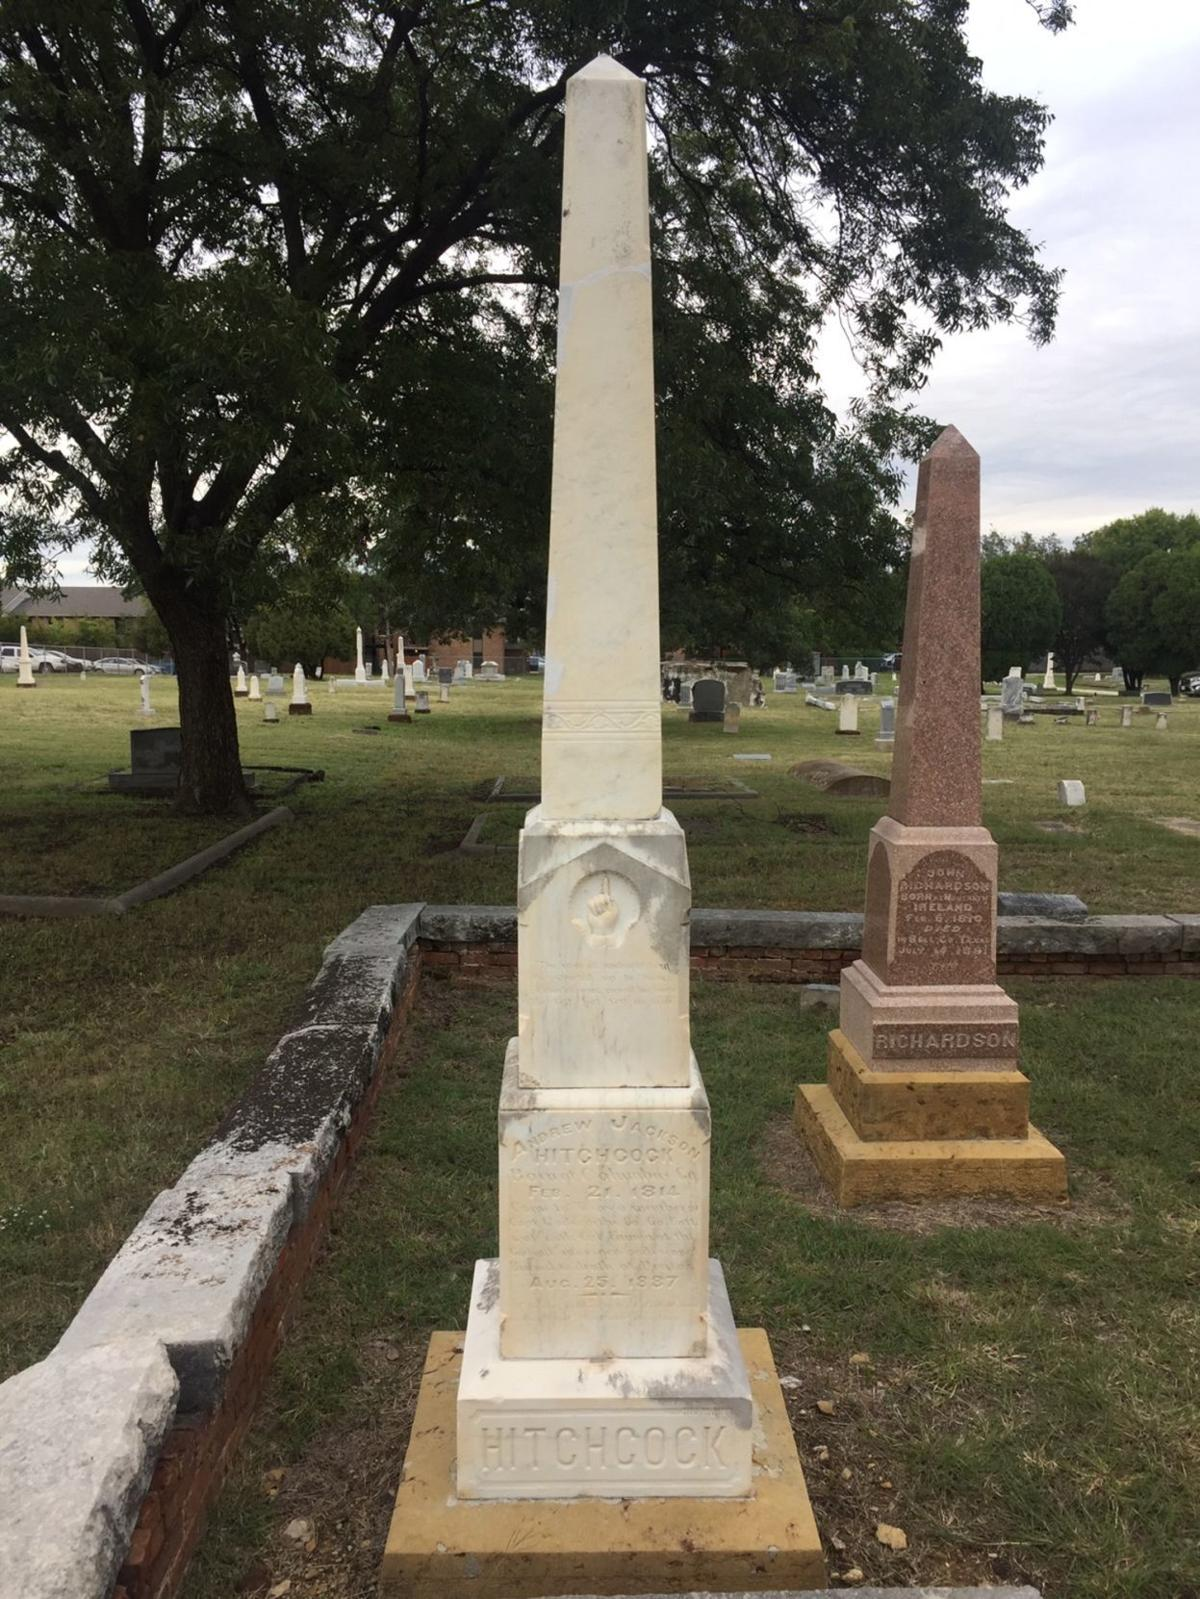 Andrew Jackson Hitchcock obelisk